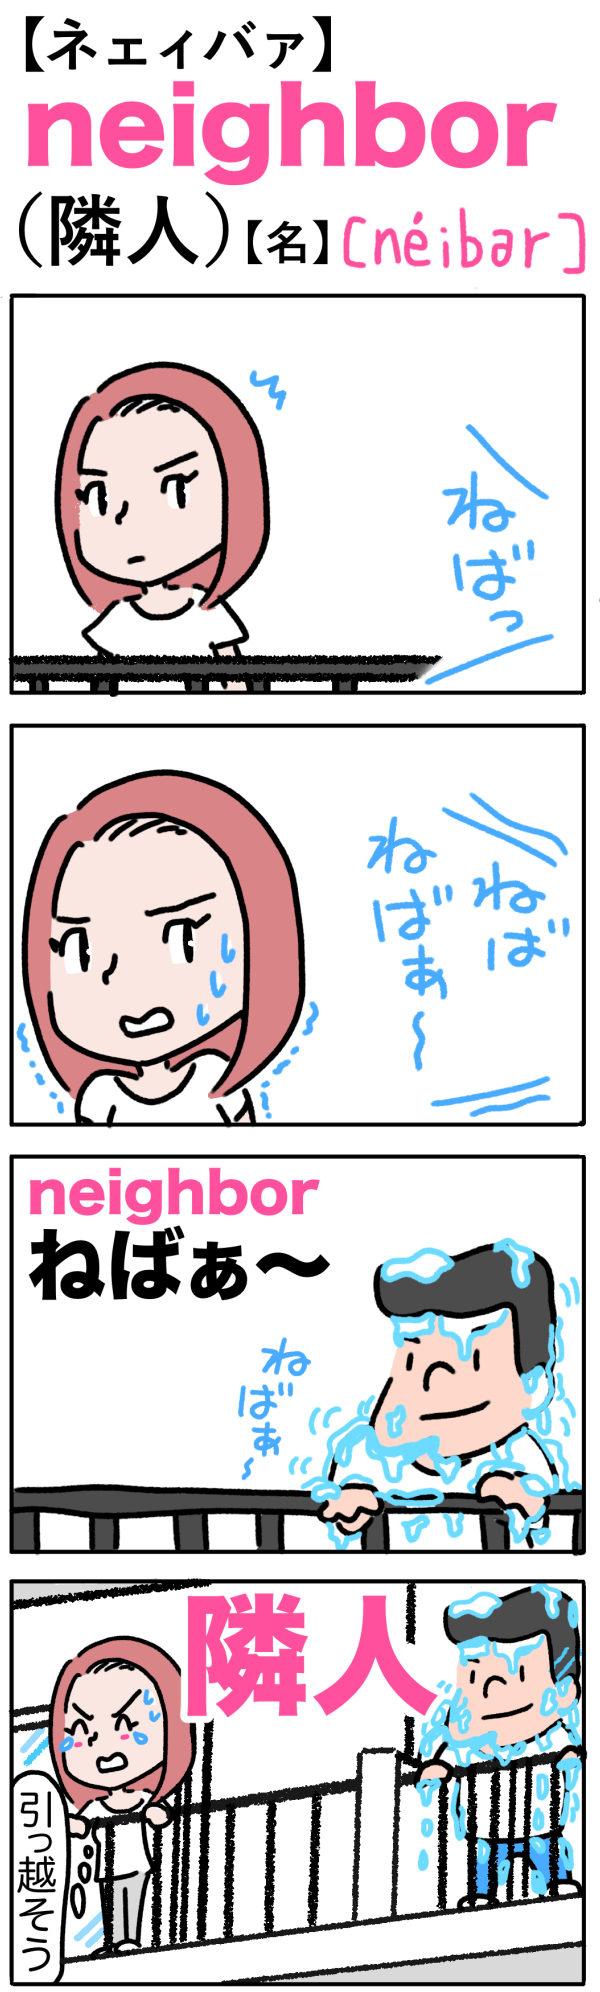 neighbor(隣人)の語呂合わせ英単語